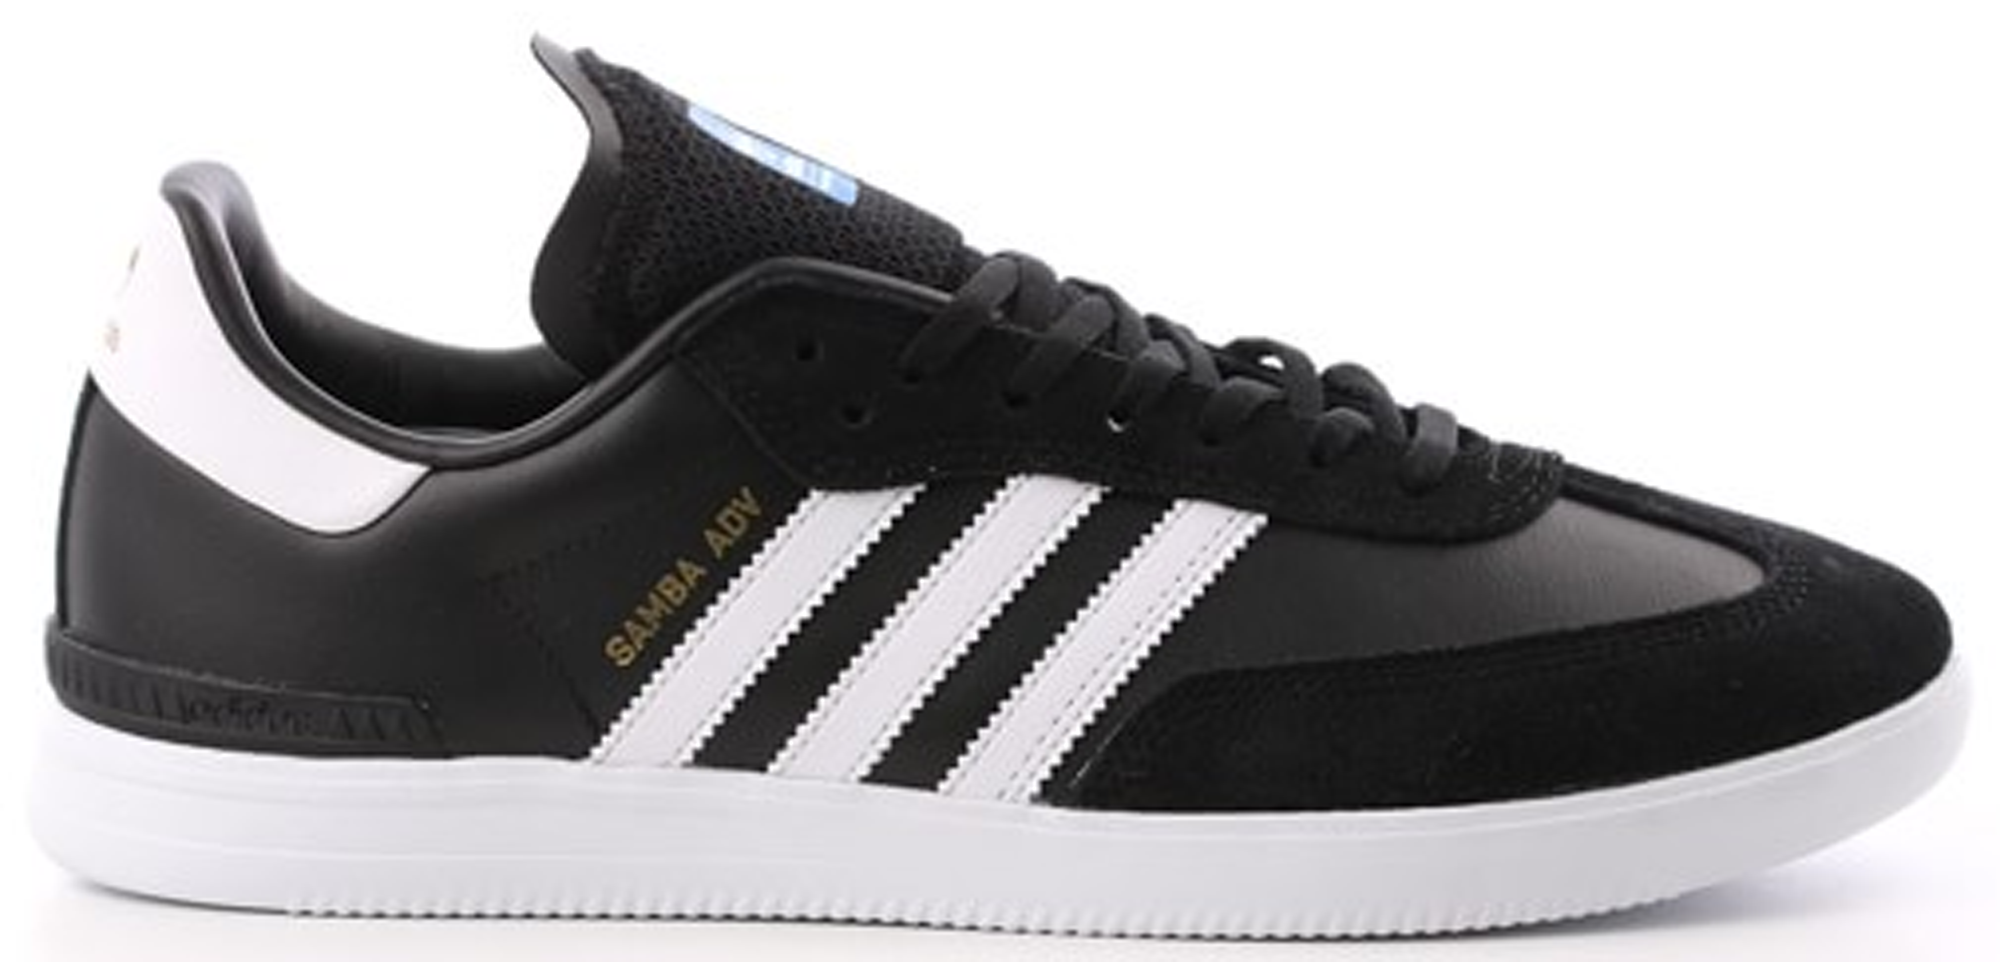 adidas Samba Adv Black White - BY3928